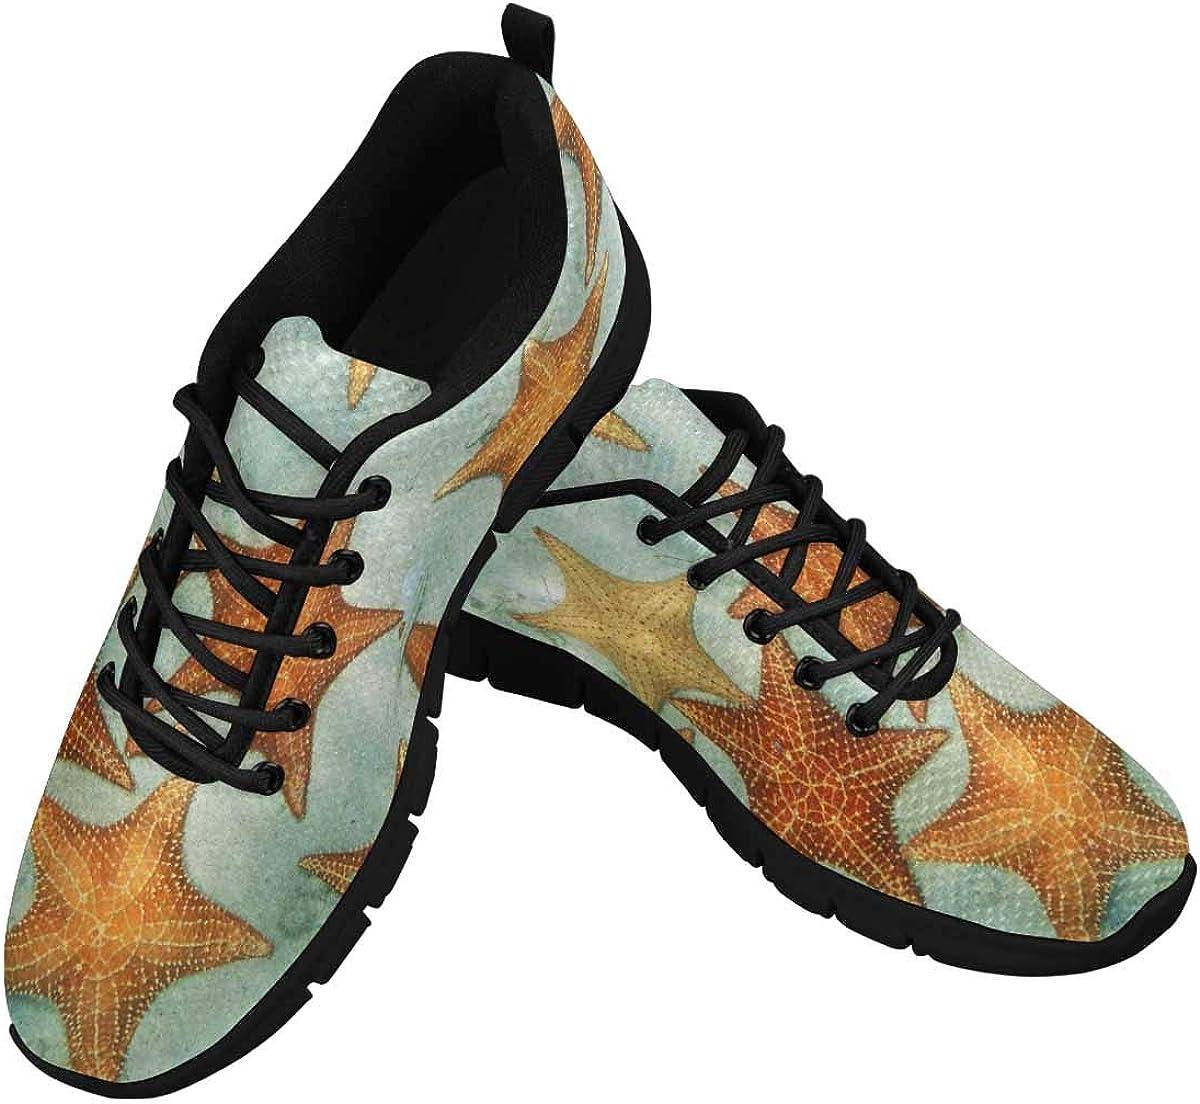 InterestPrint Cushion Starfish in The Caribbean Sea Women's Athletic Walking Shoes Comfort Mesh Non Slip